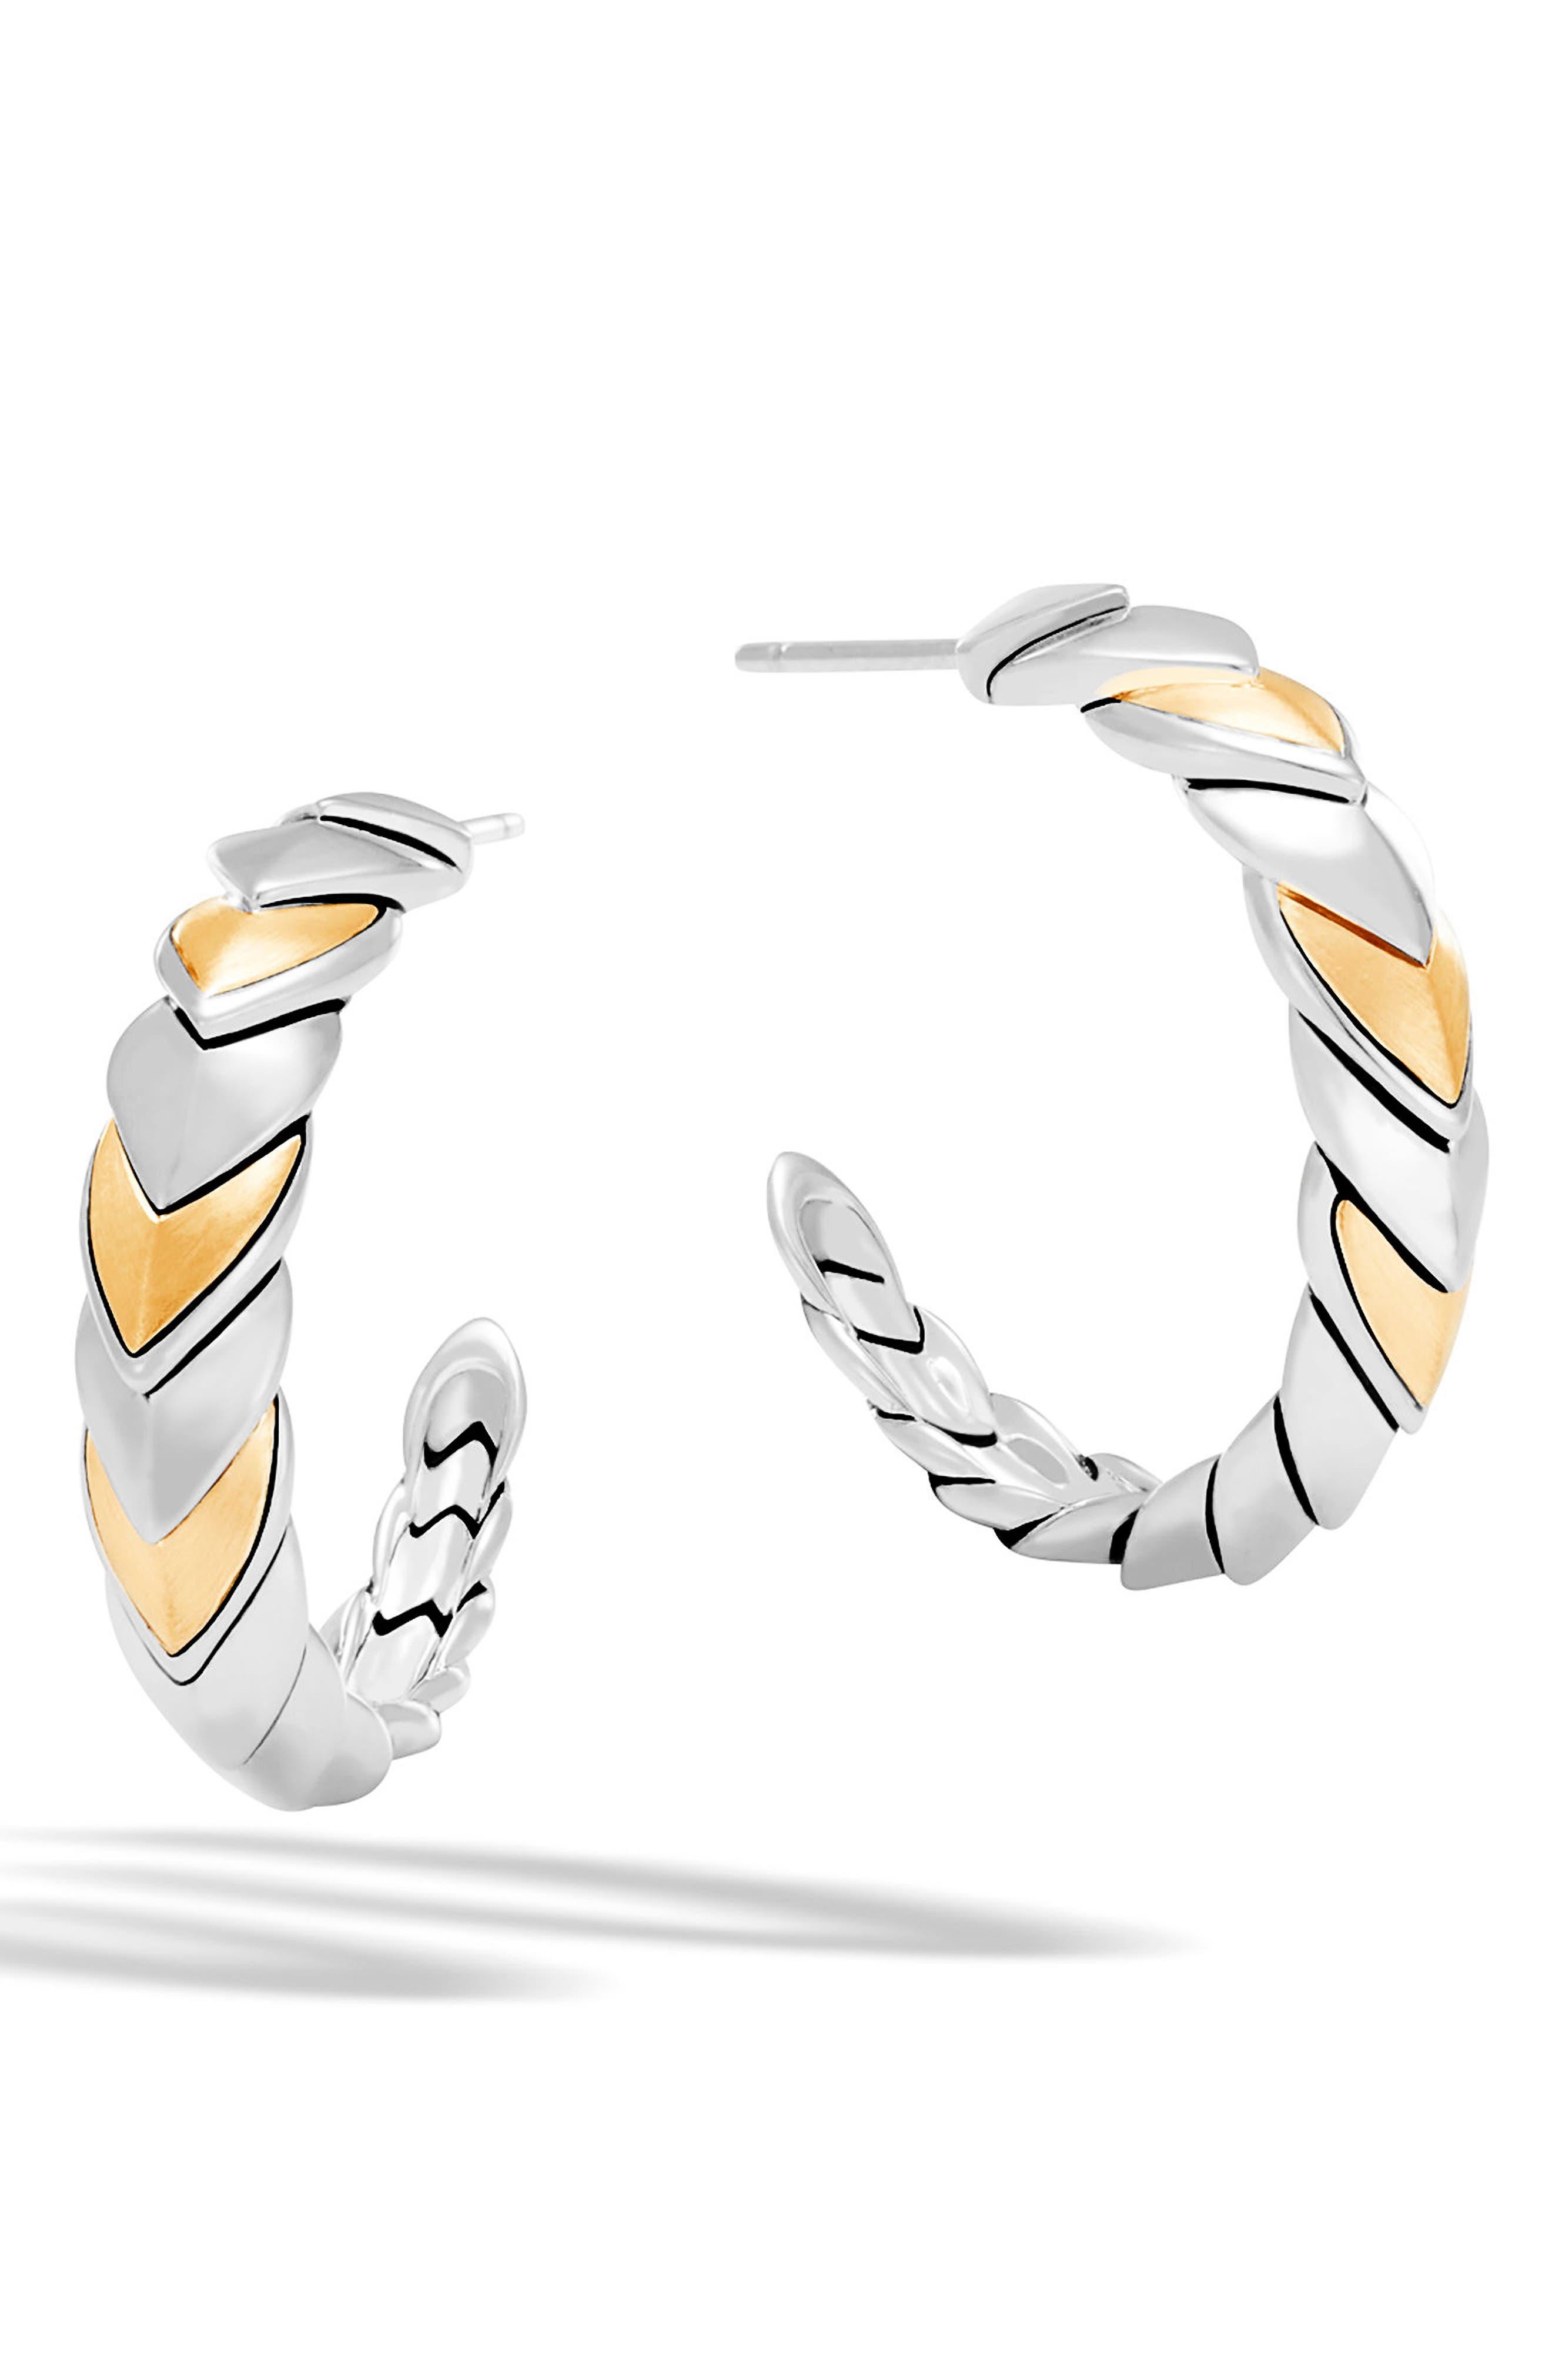 Legends Naga Hoop Earrings,                         Main,                         color, Silver/ Gold